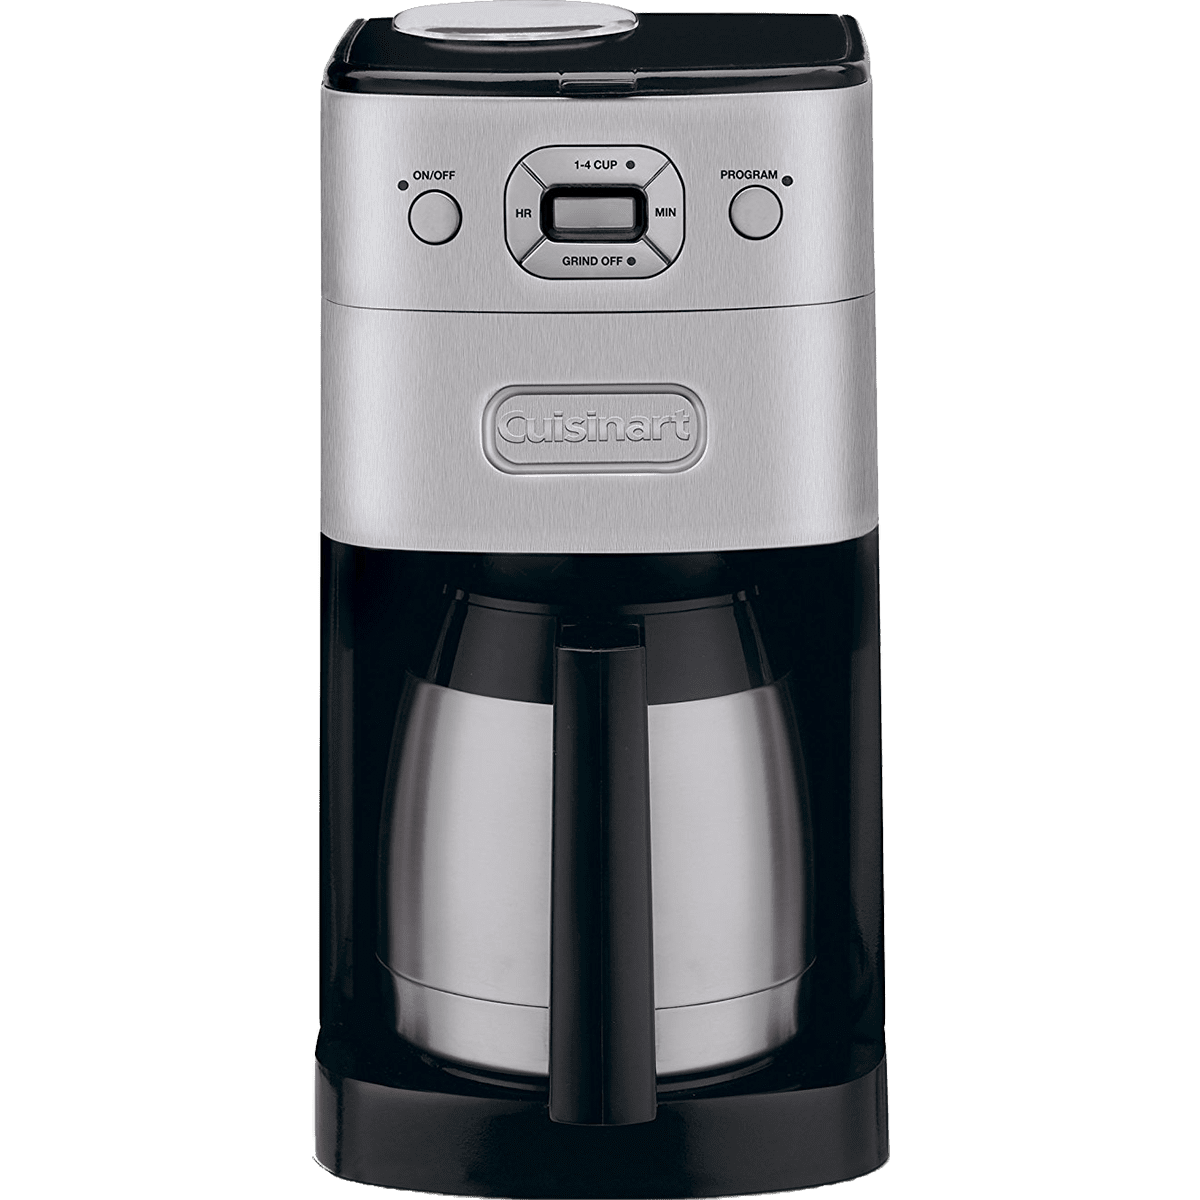 Cuisinart Grind & Brew Coffee Maker (DGB-625BC) Quench Essentials